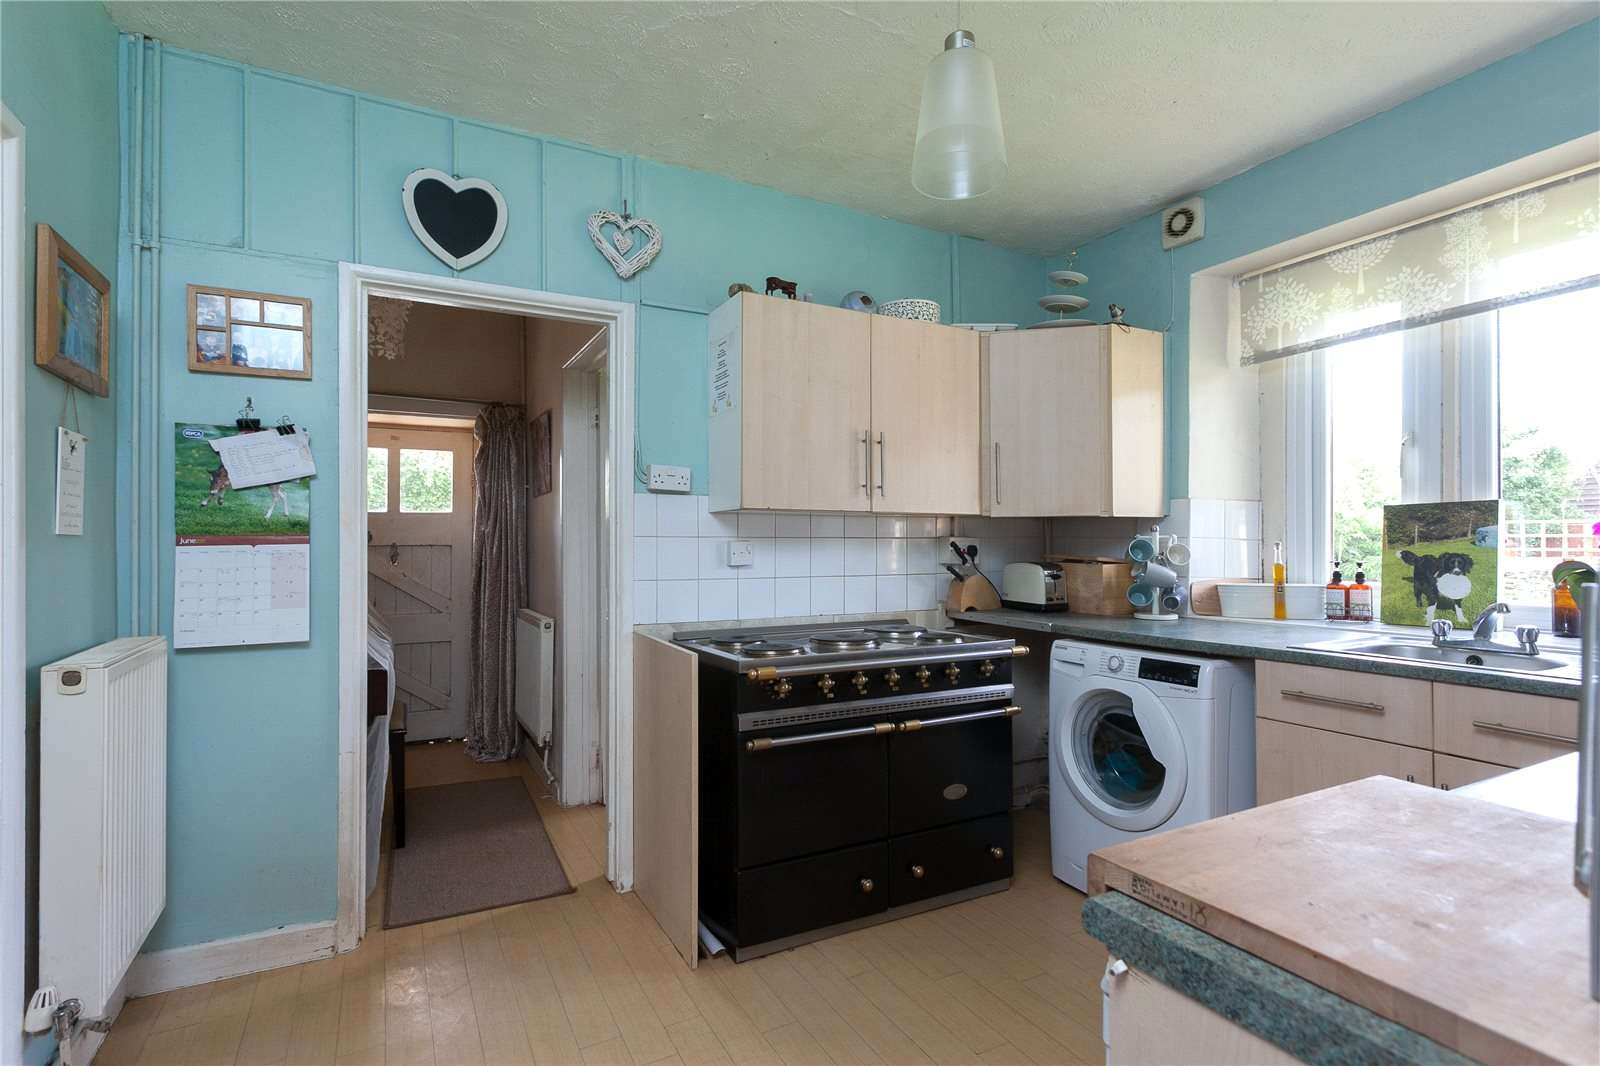 Savills | The Street, Latton, Swindon, SN6 6DJ | Property for sale